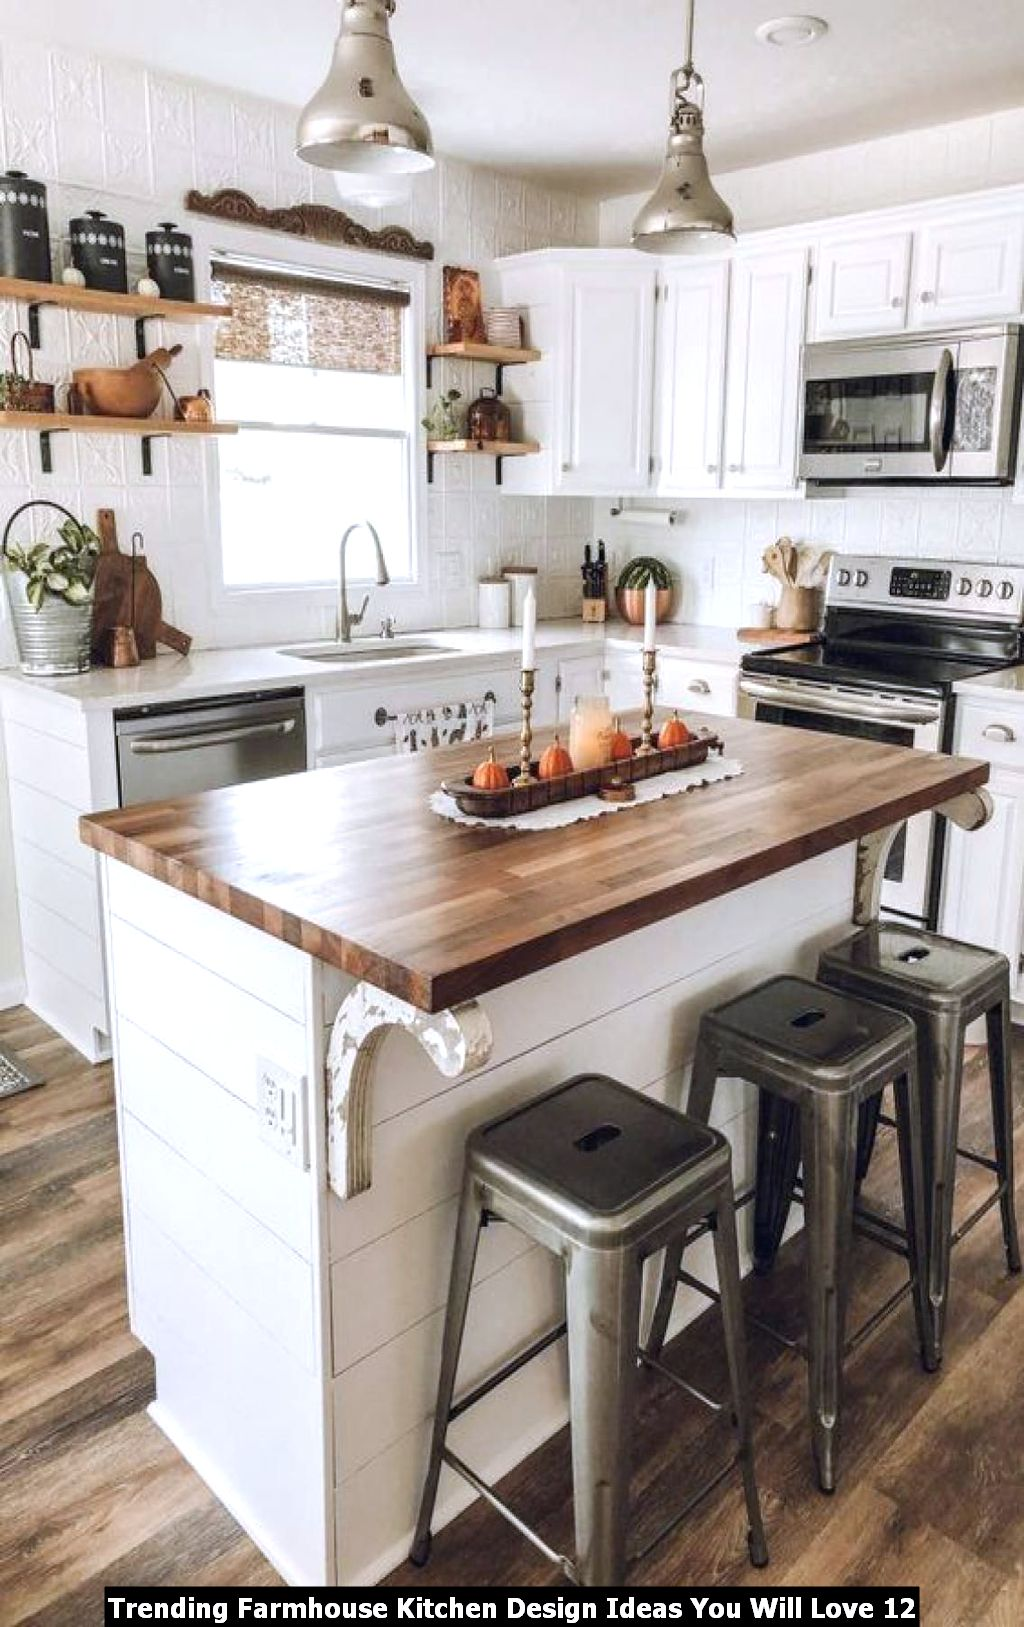 Trending Farmhouse Kitchen Design Ideas You Will Love 12